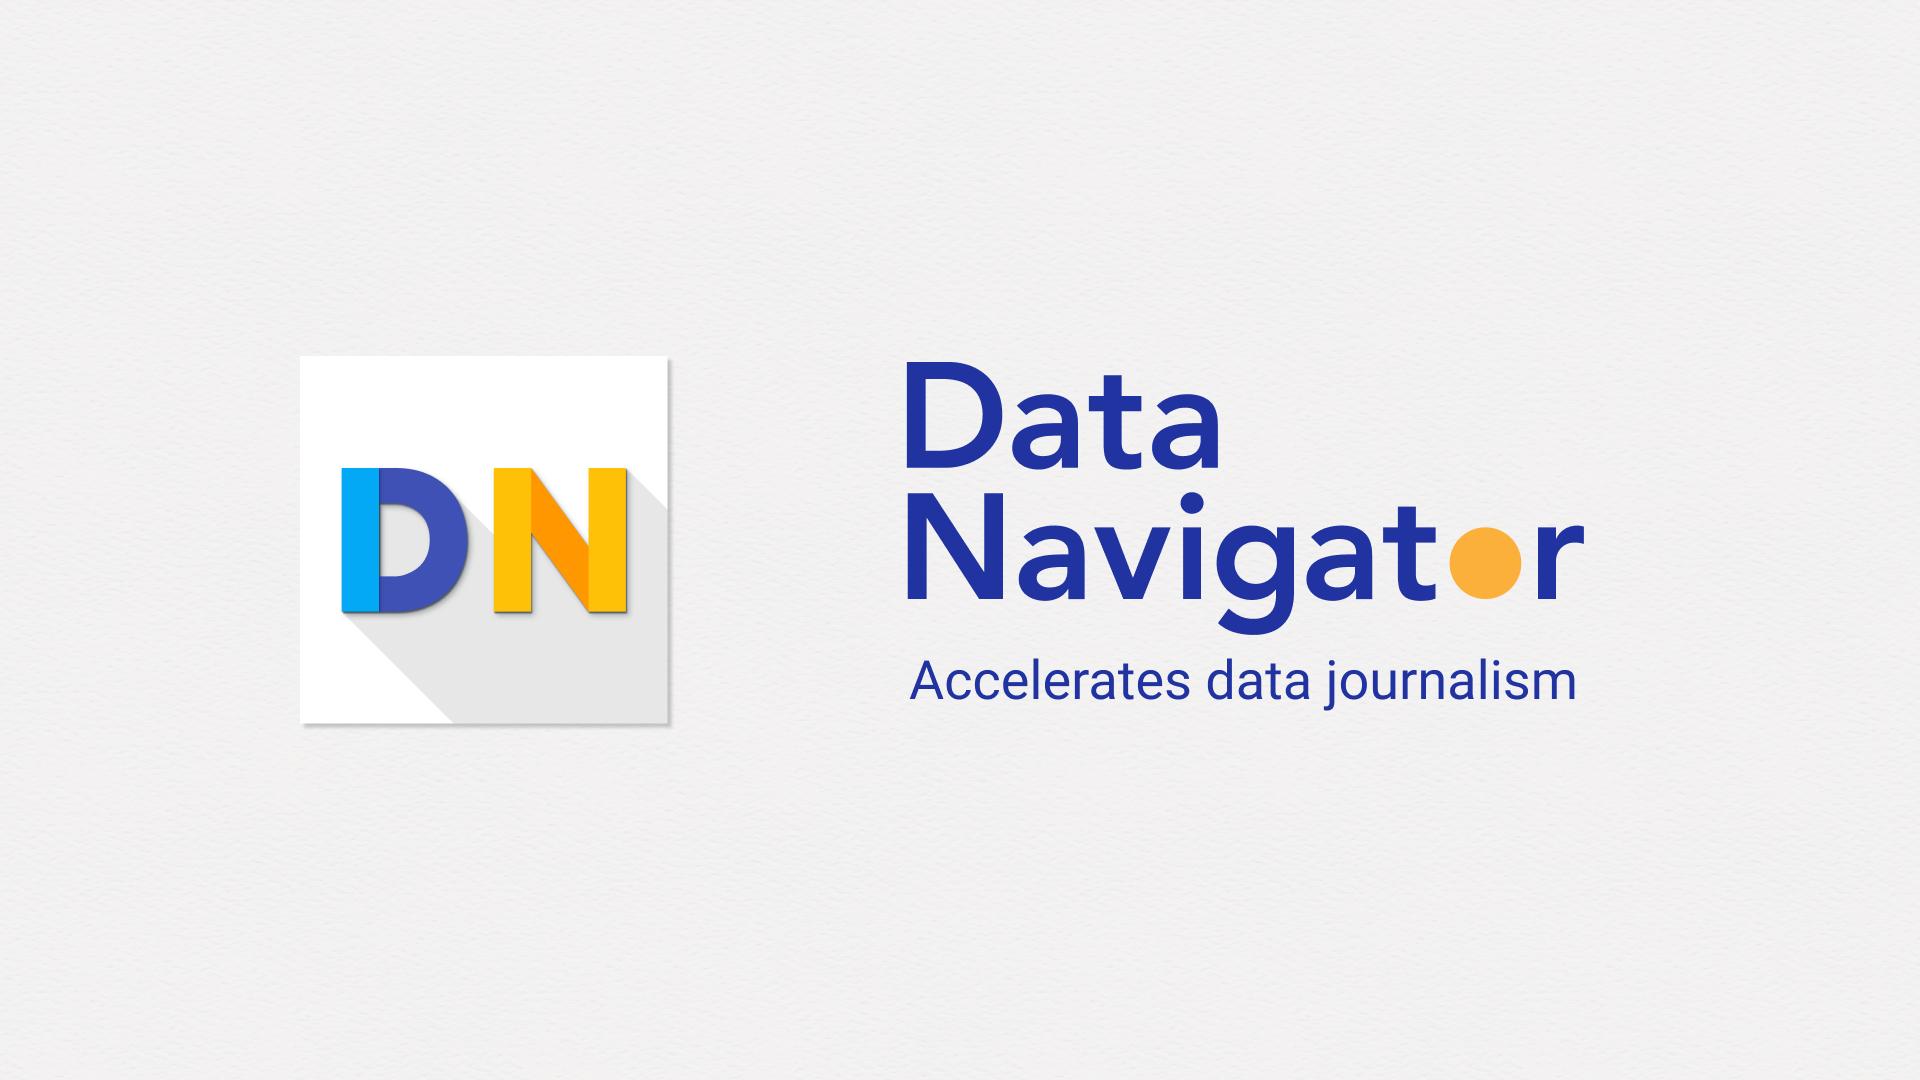 DataNavigator